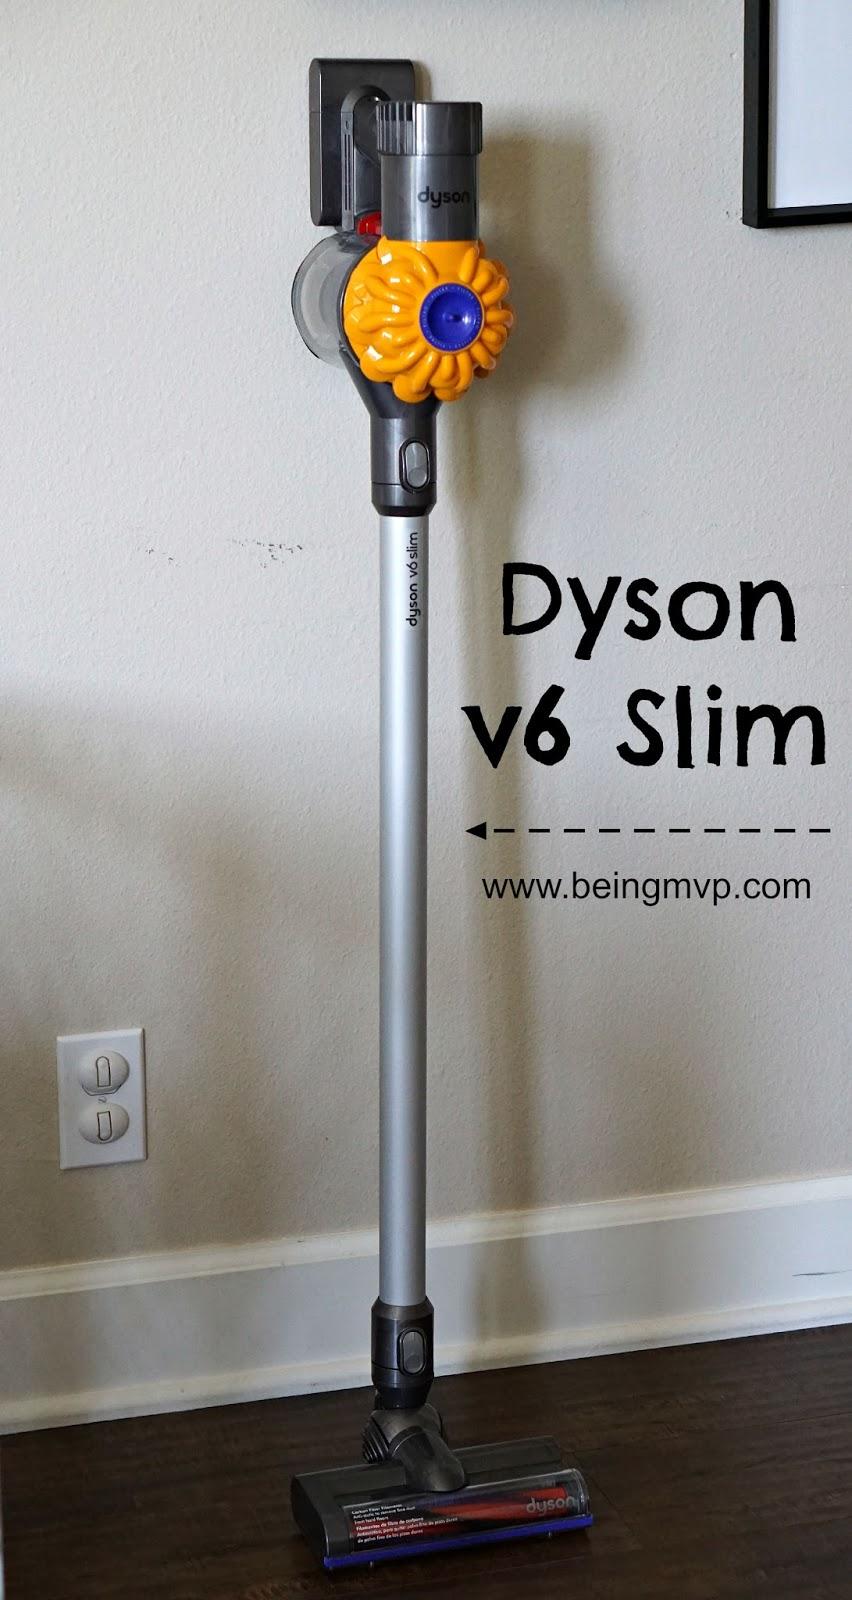 being mvp dyson v6 slim vacuum review dyson. Black Bedroom Furniture Sets. Home Design Ideas